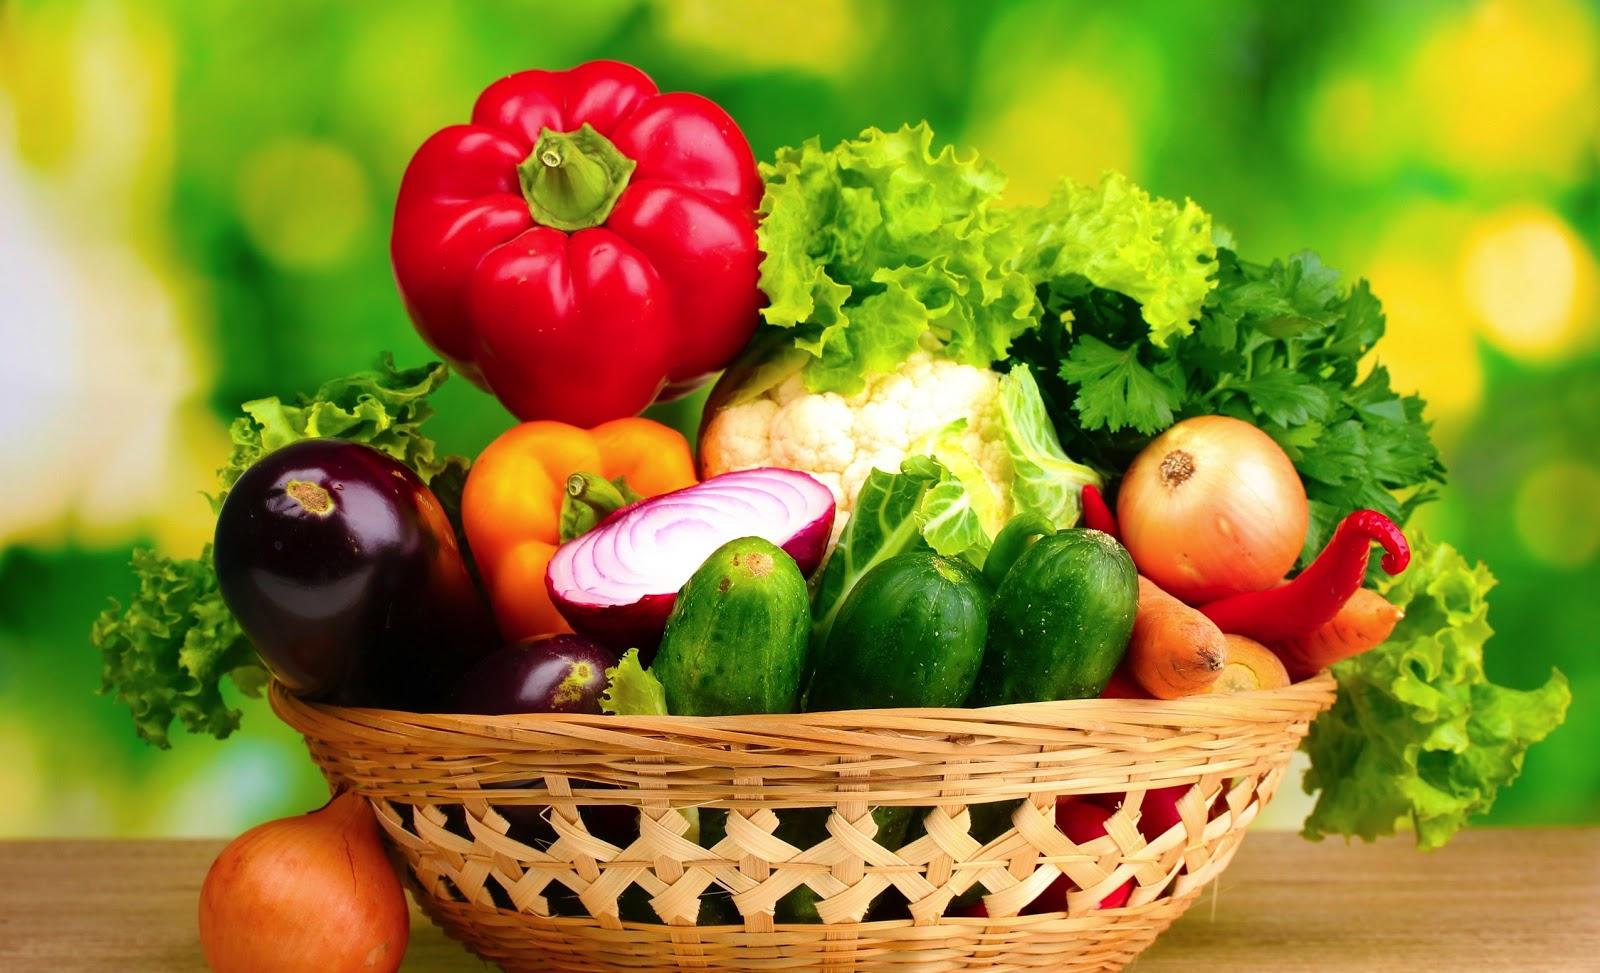 Talk 22. Good quality diet veg